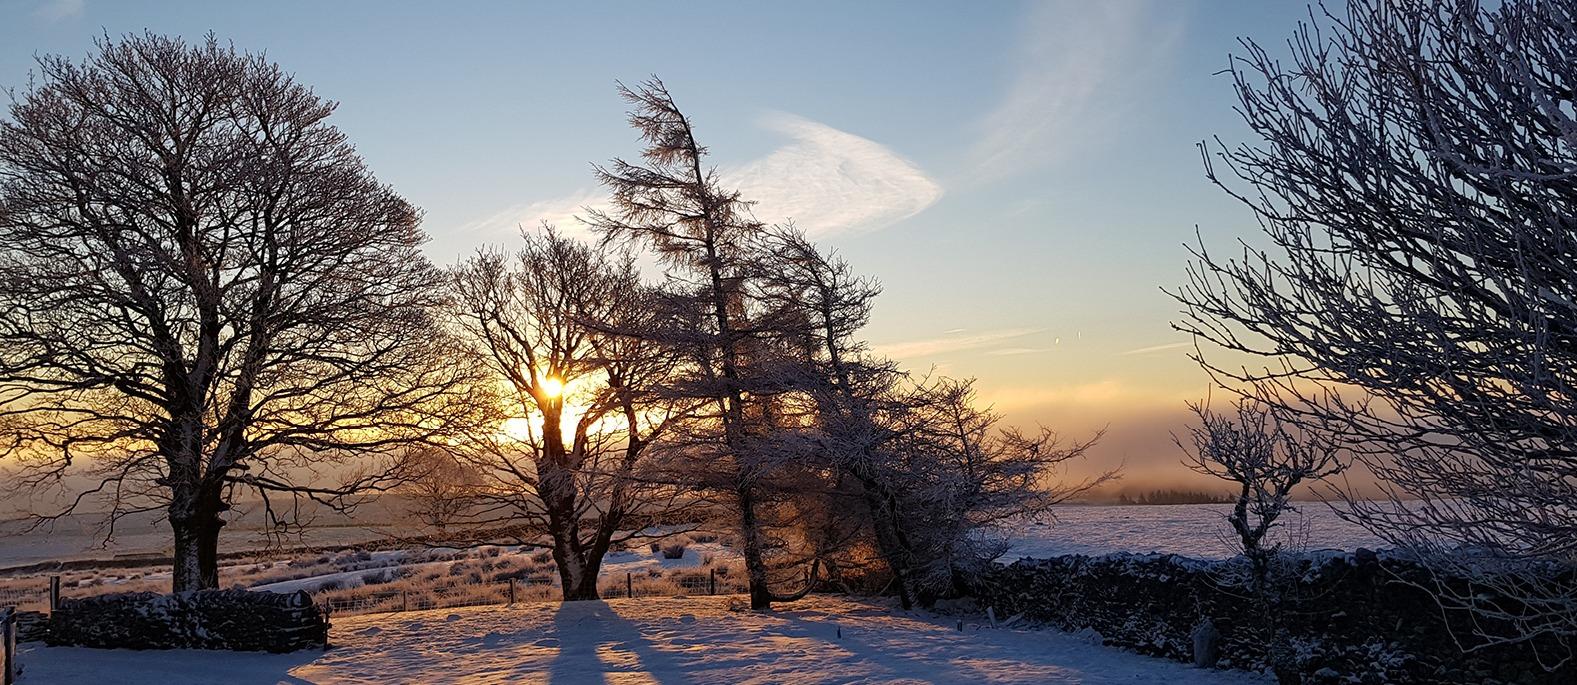 Snowy garden at dawn